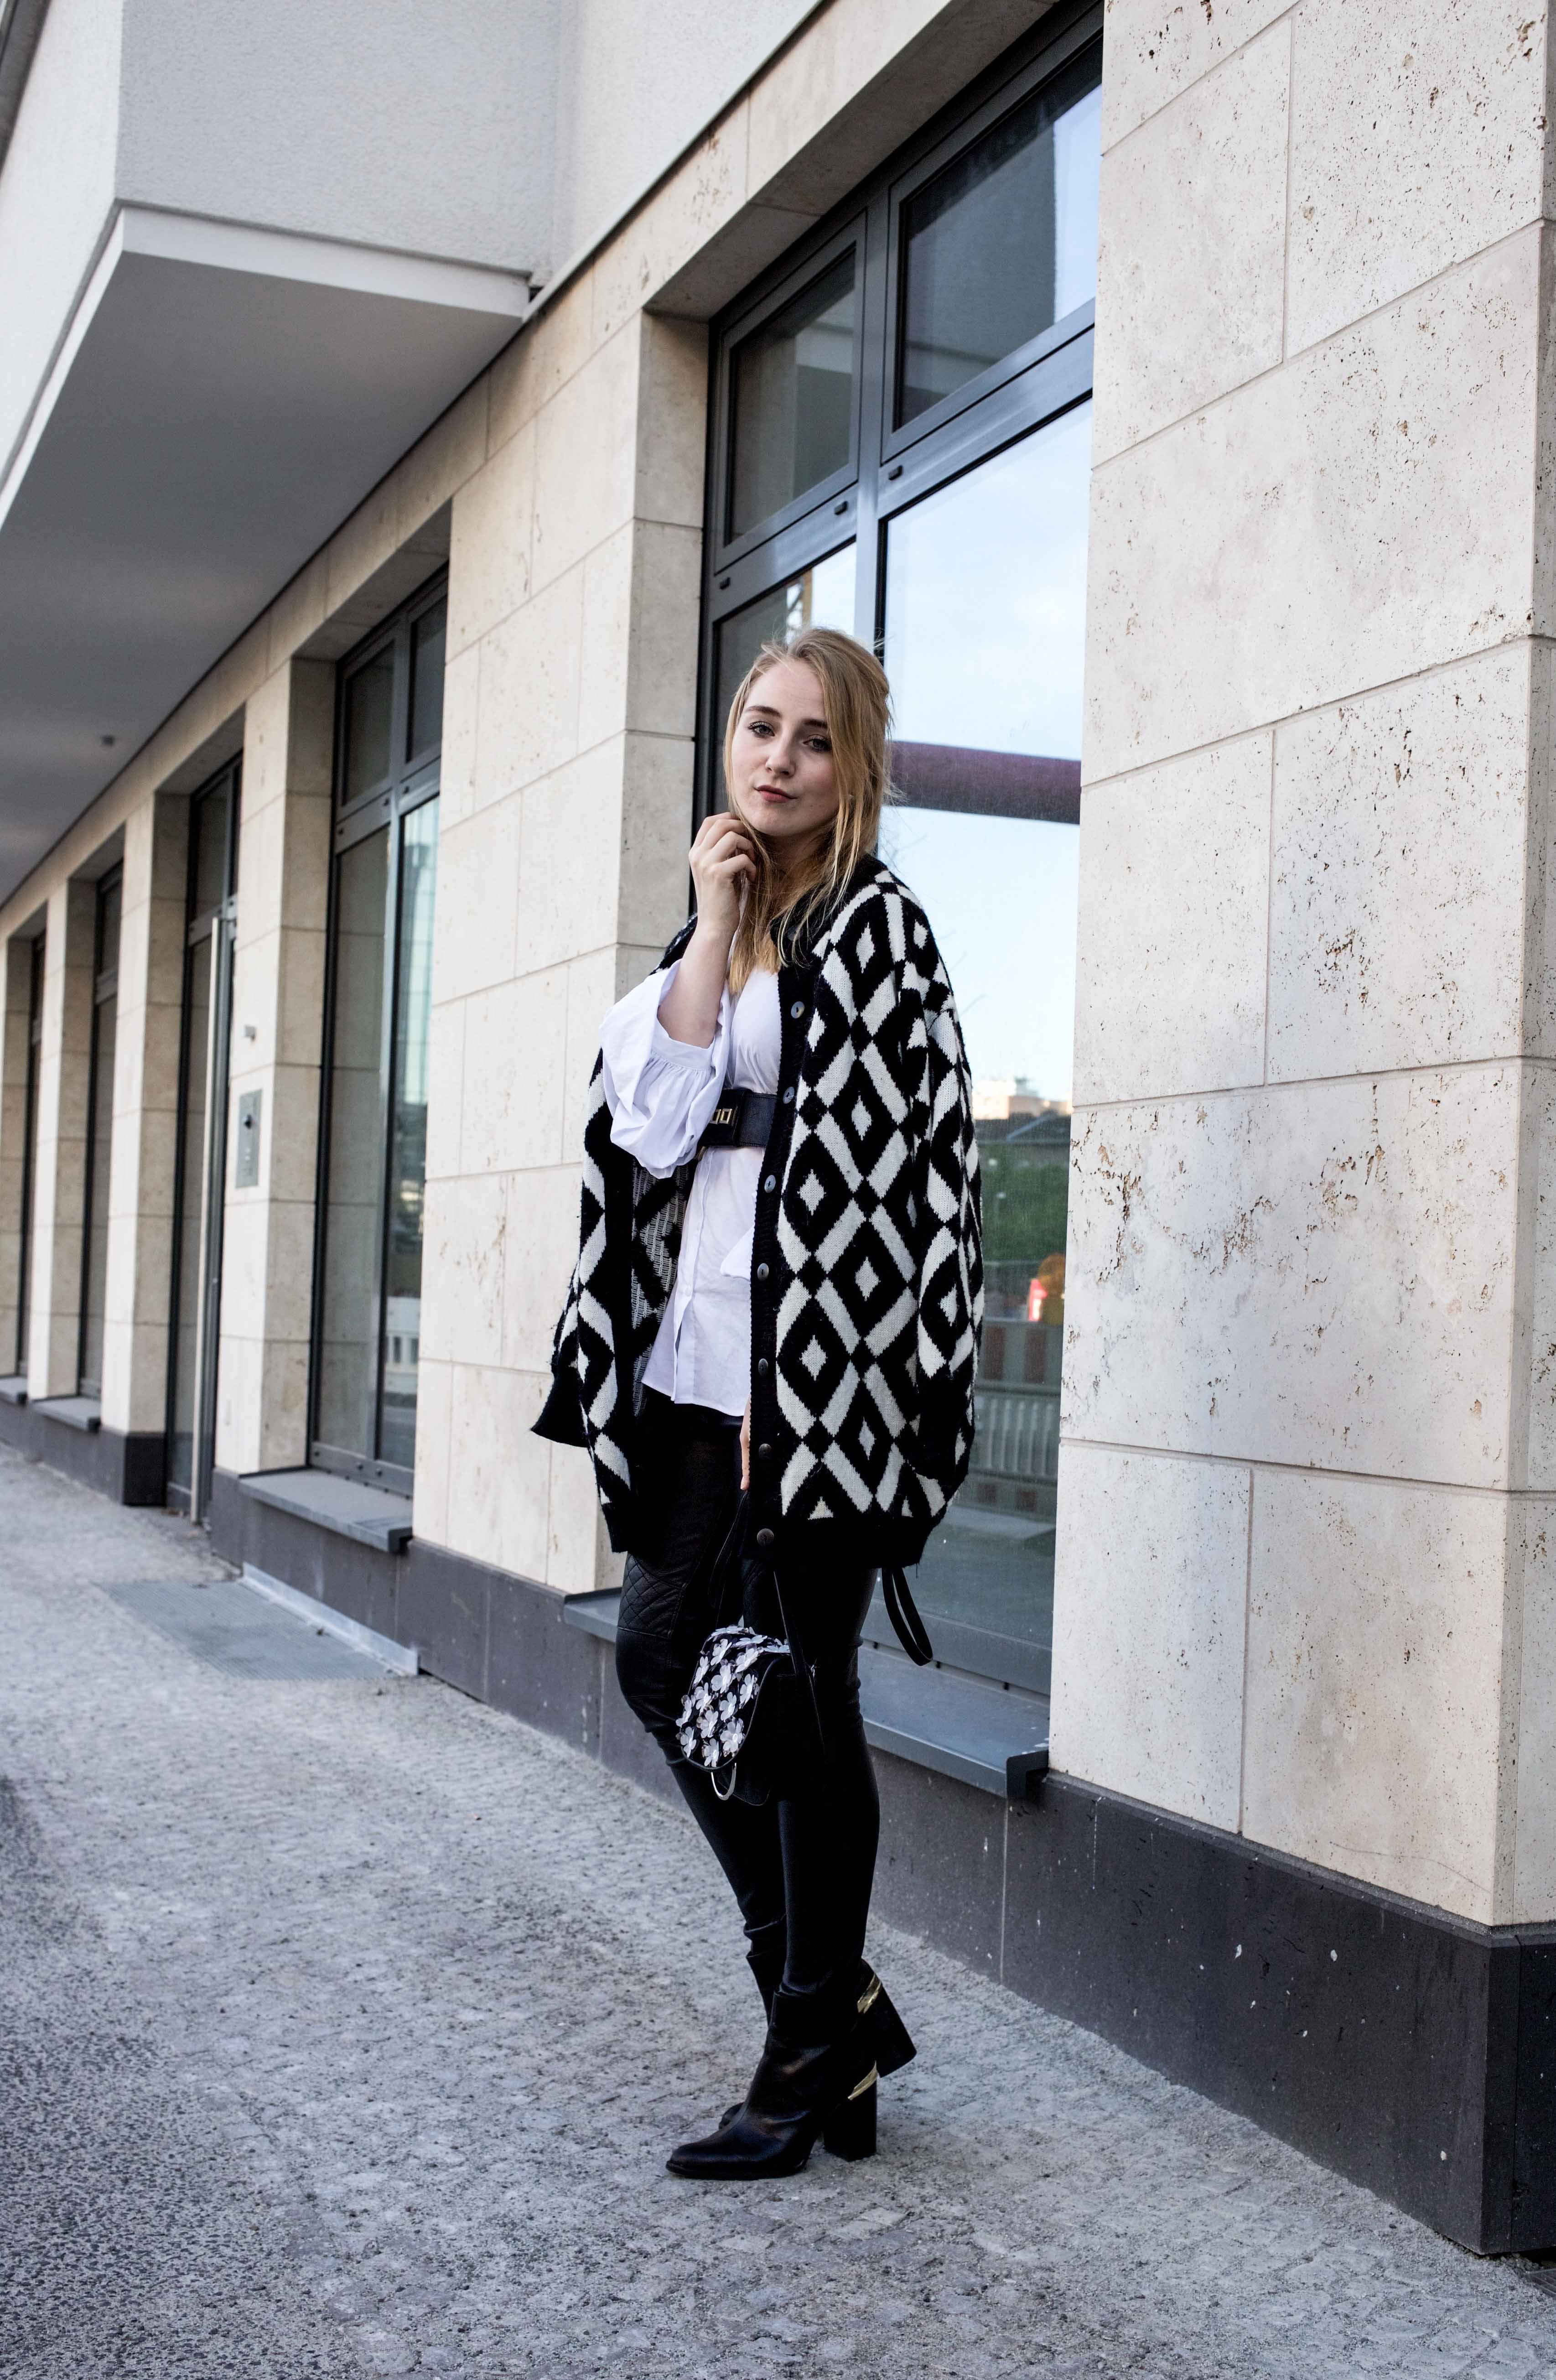 trendreport-weiße-bluse-trompetenärmel-fashionblog-ootd-modeblog-berlin_8762